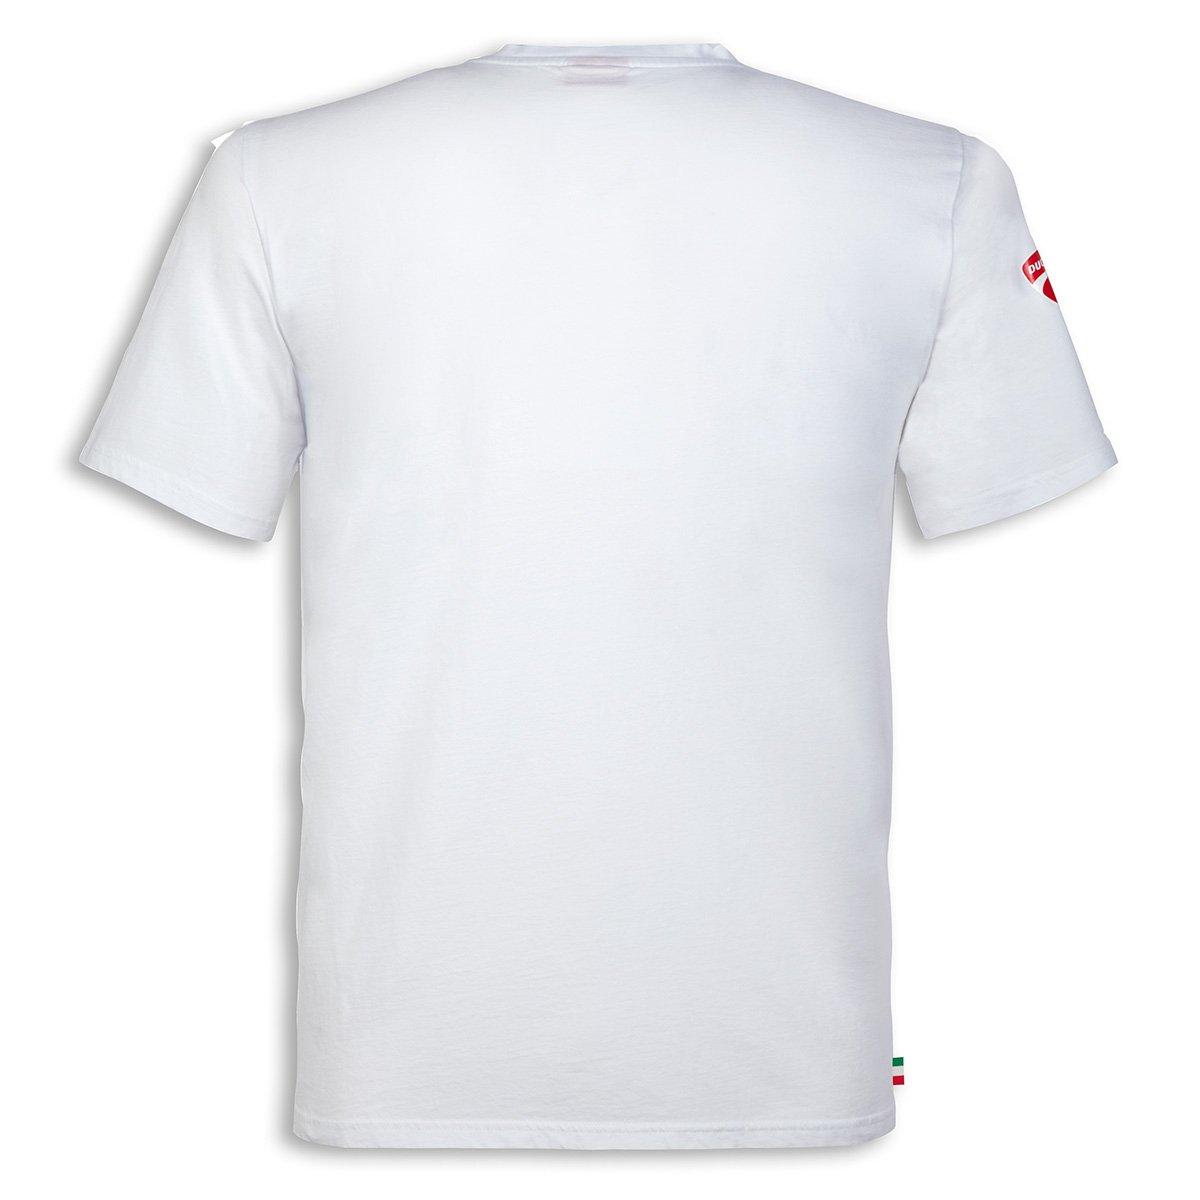 Ducatiana 2 T-Shirt Red